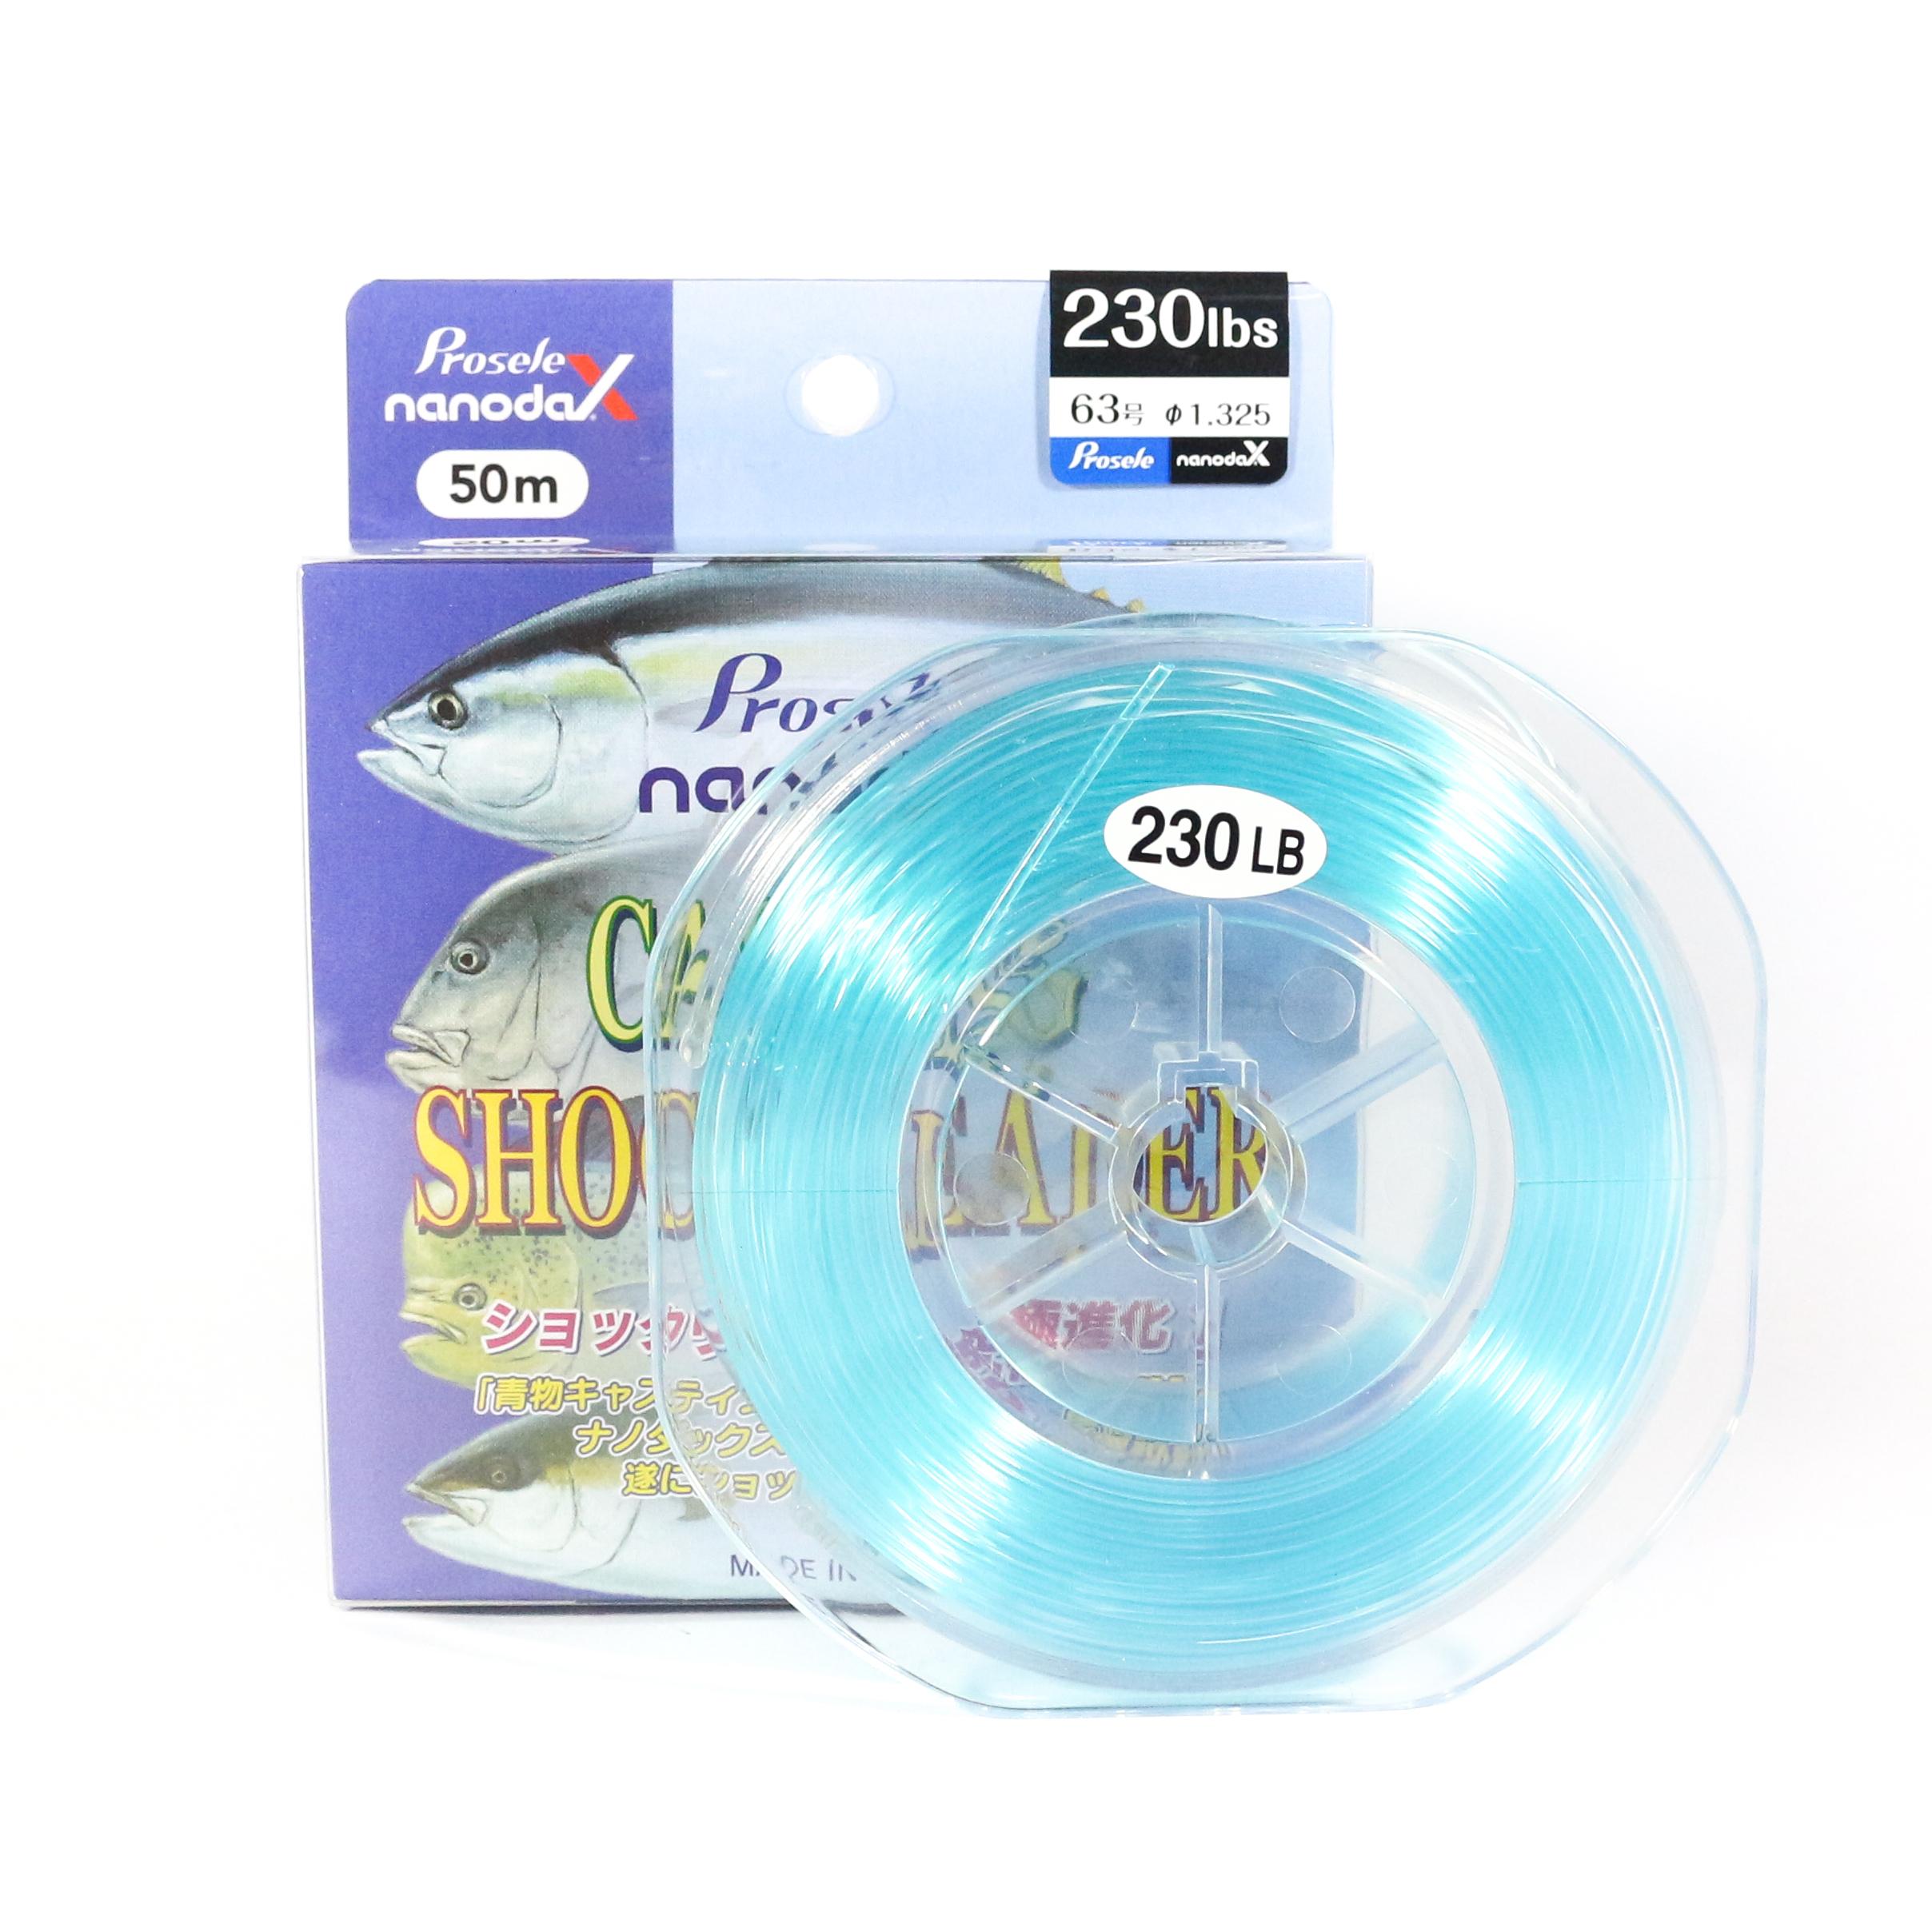 Sanyo Prosele Nanodax Nylon Shock Leader 50M 230lb (0823)